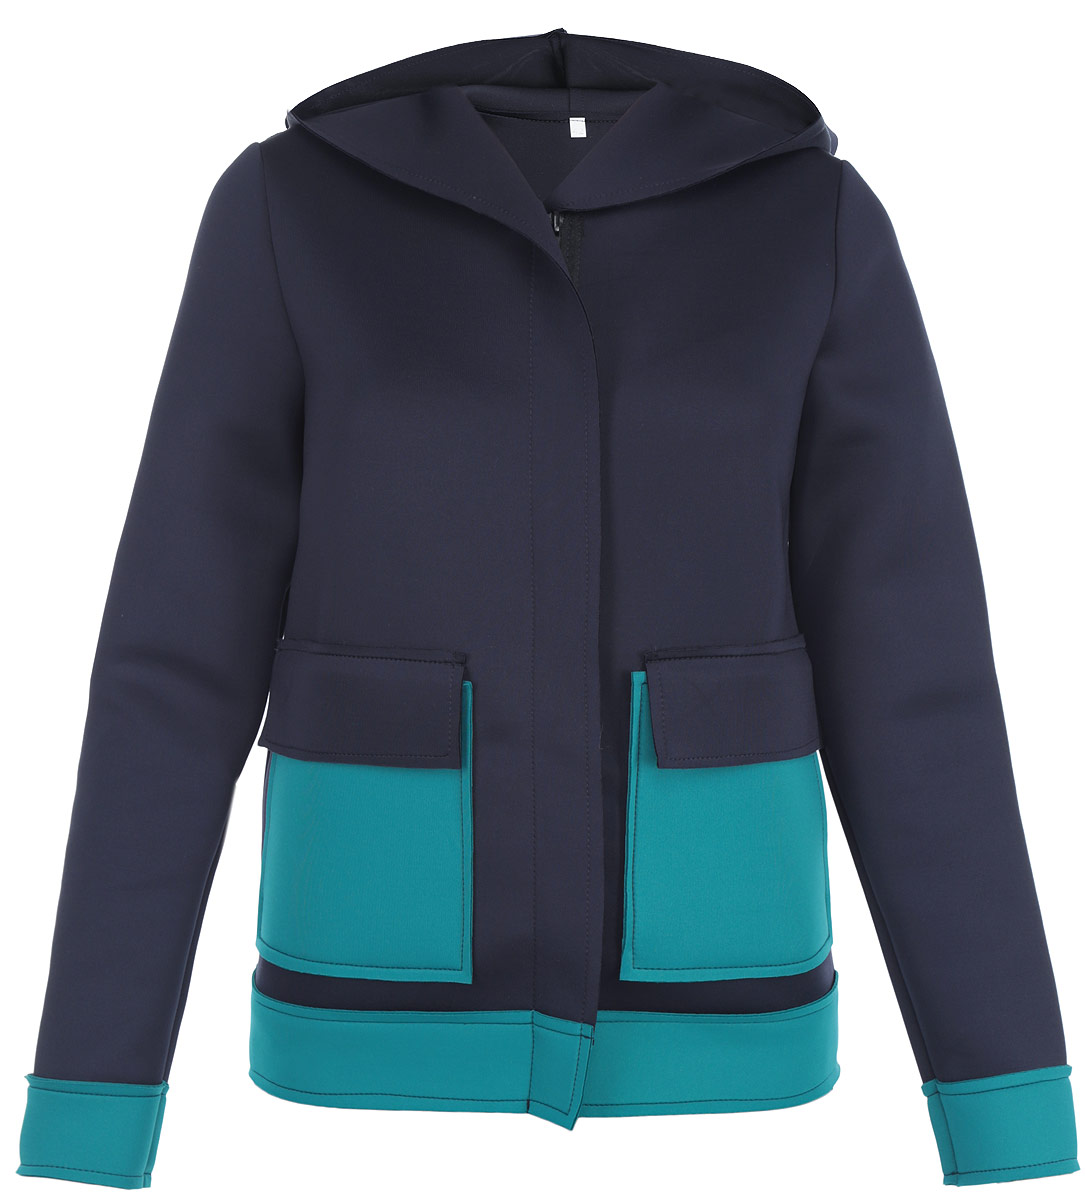 цена  Жакет Milana Style, цвет: темно-синий, бирюзовый. м1001. Размер 50  онлайн в 2017 году